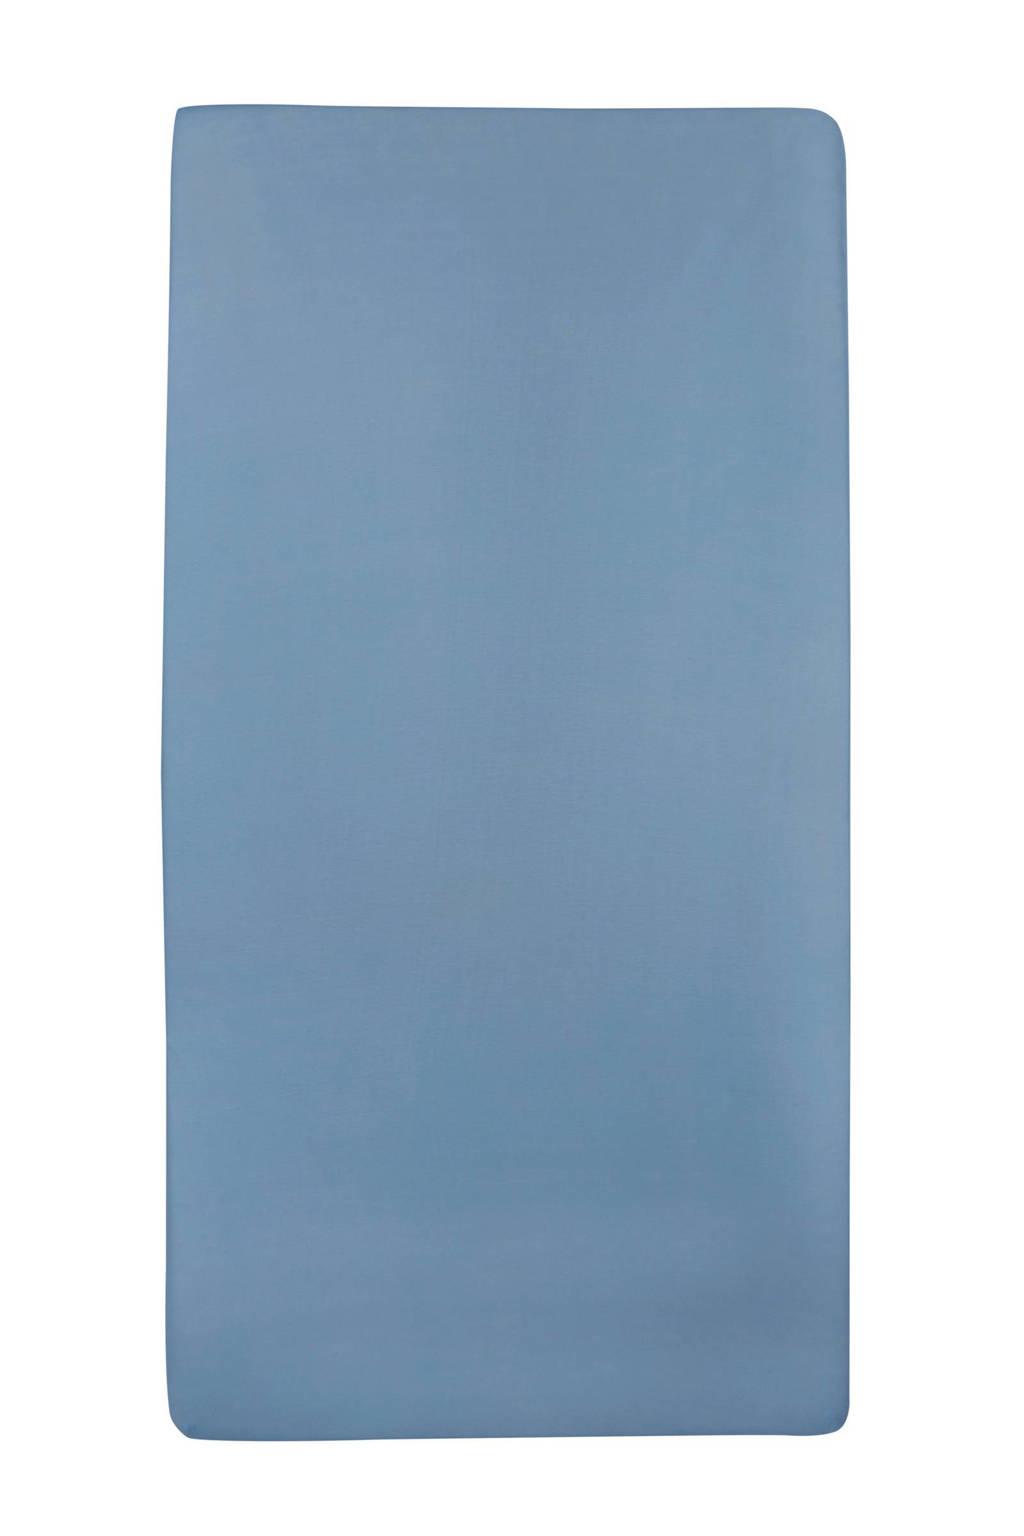 Meyco jersey baby hoeslaken ledikant 60x120 cm, jeans